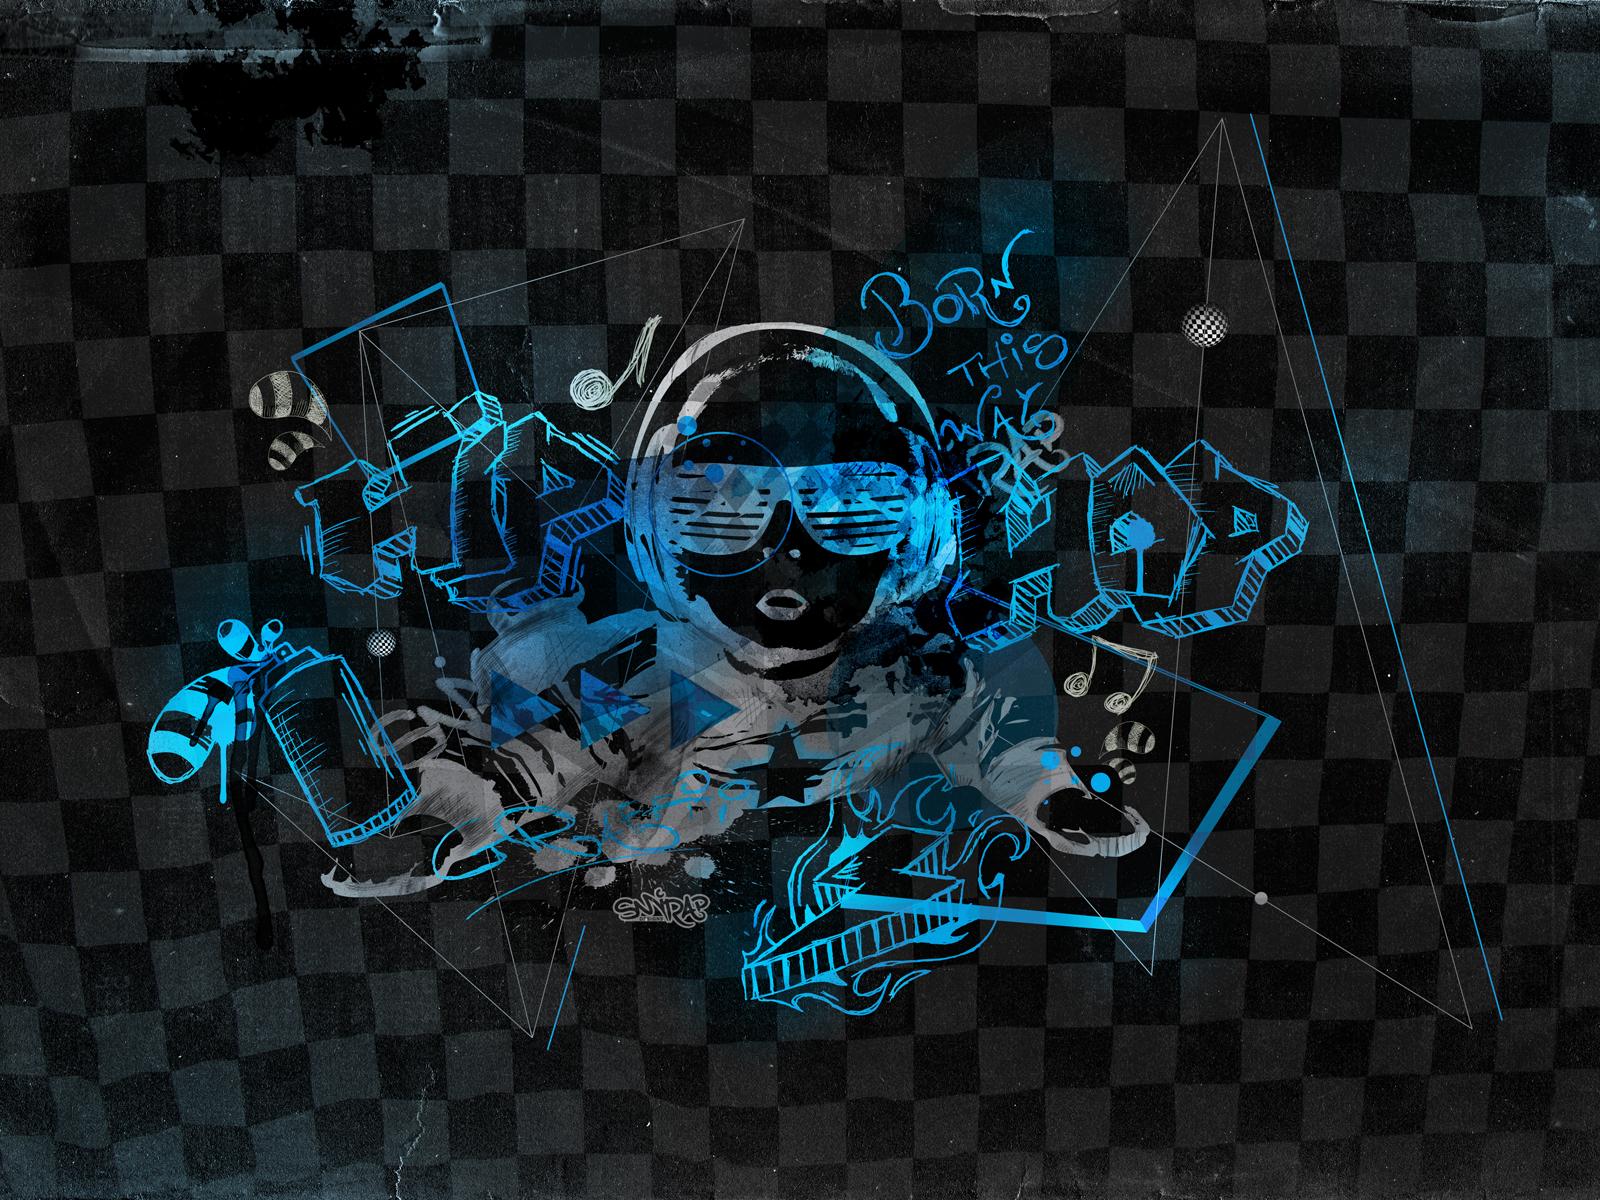 3d Graffiti Wallpapers Free Download 2